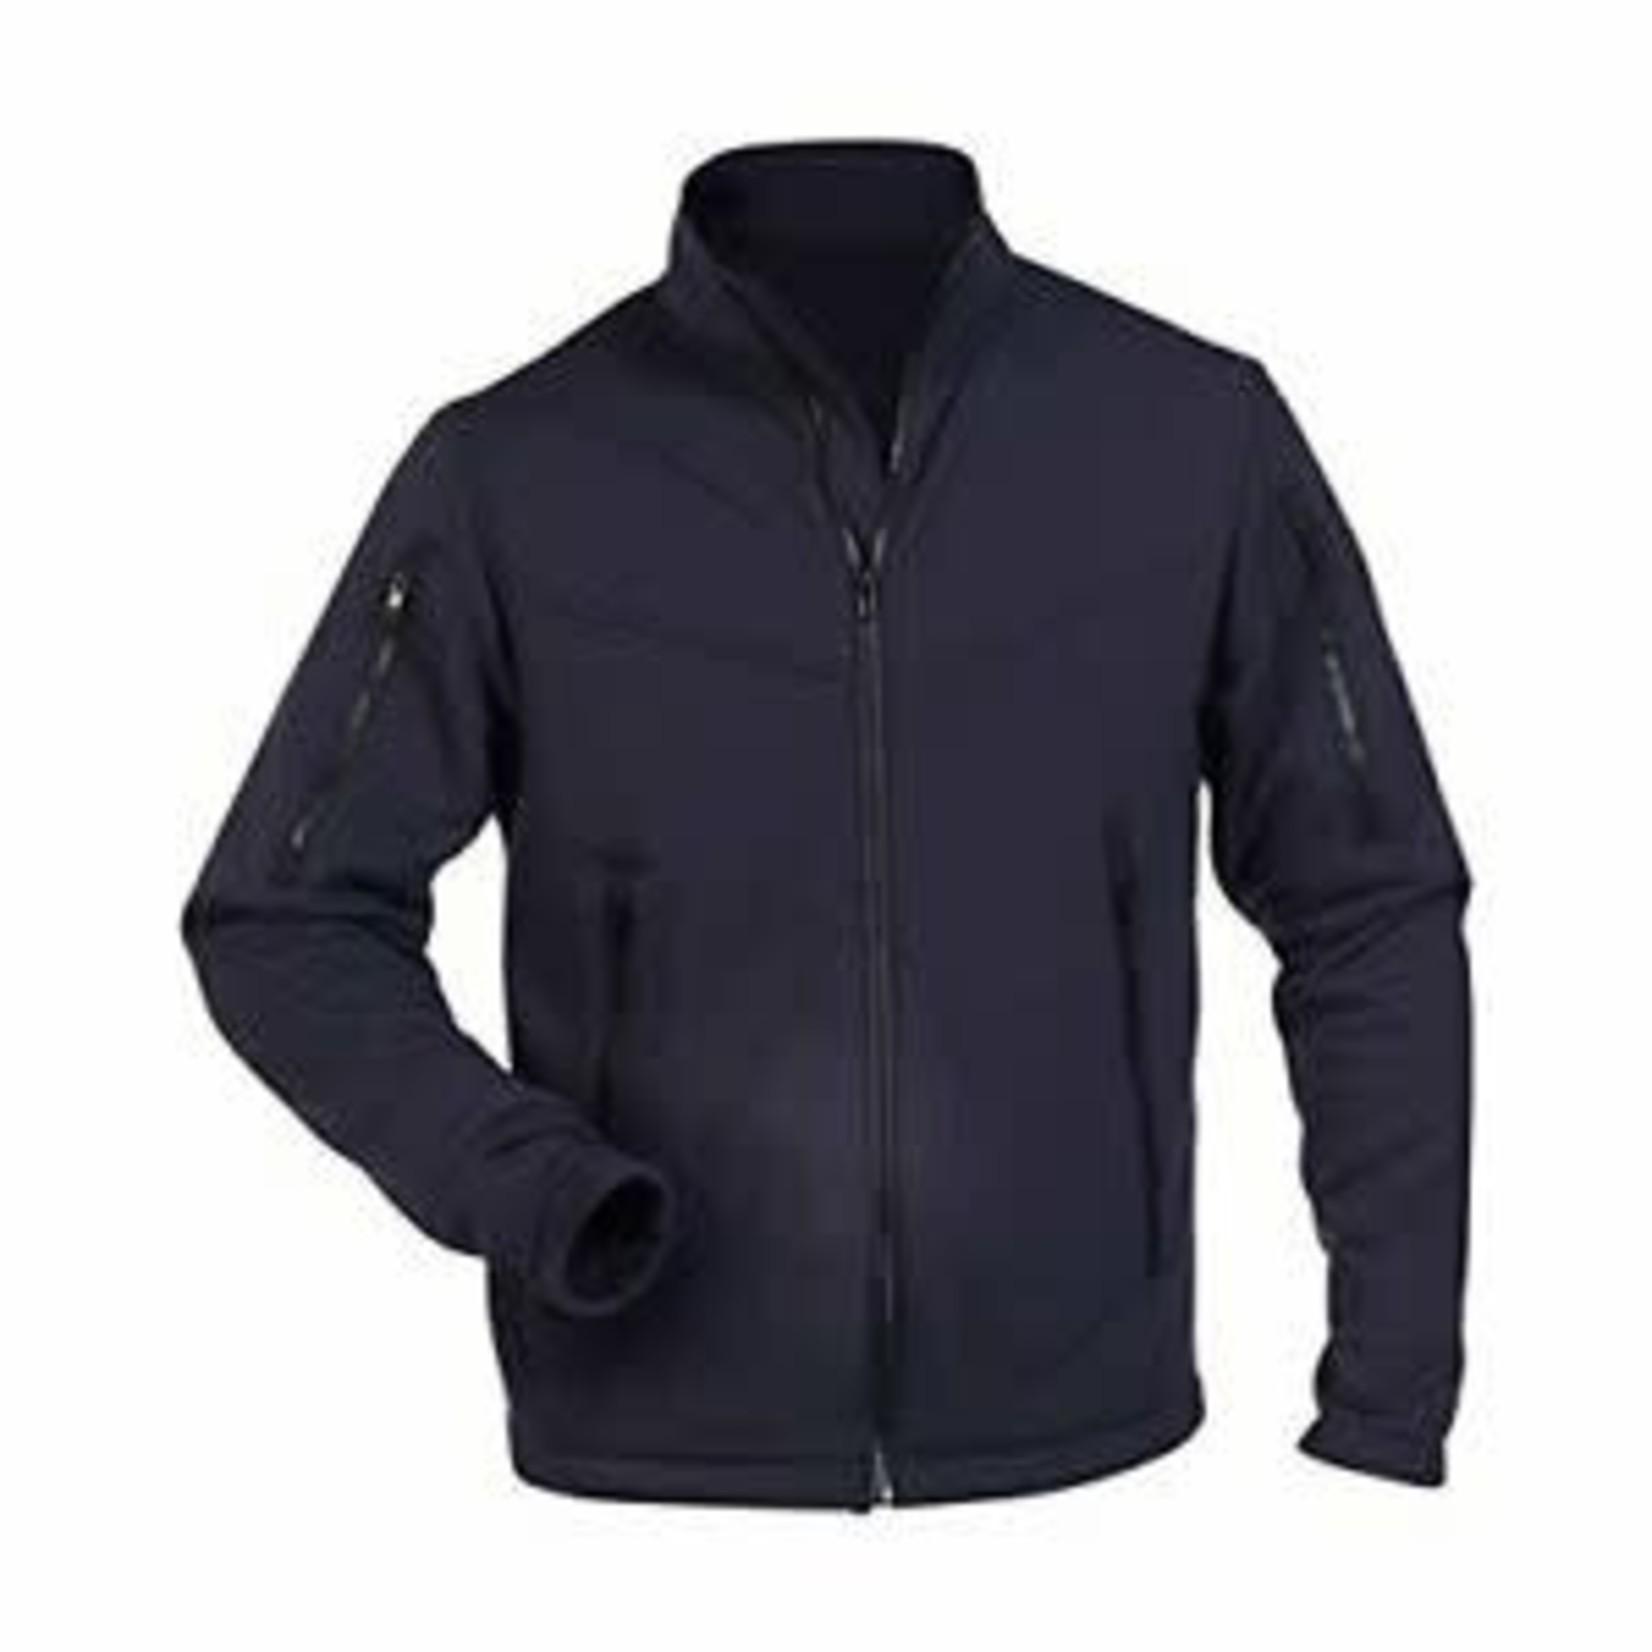 5.11 Tactical 5.11 Men's FR Plolartac Fleece Jacket